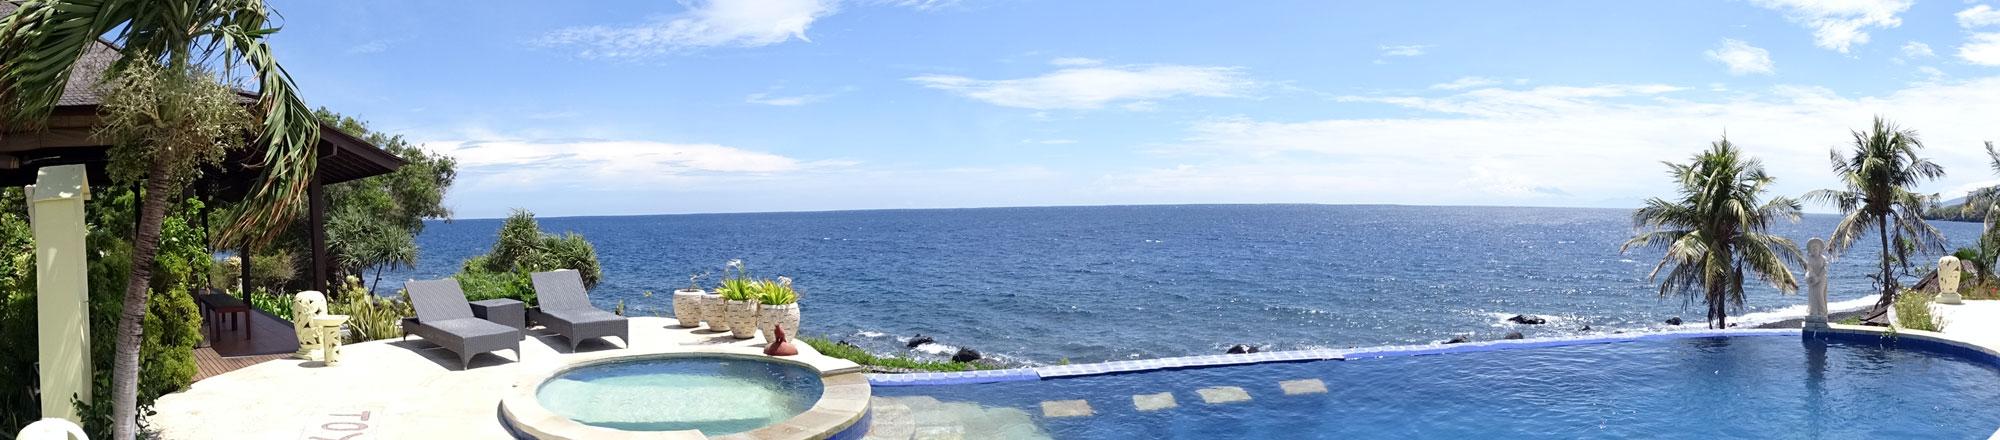 Bali oceanfront hotel resort for sale